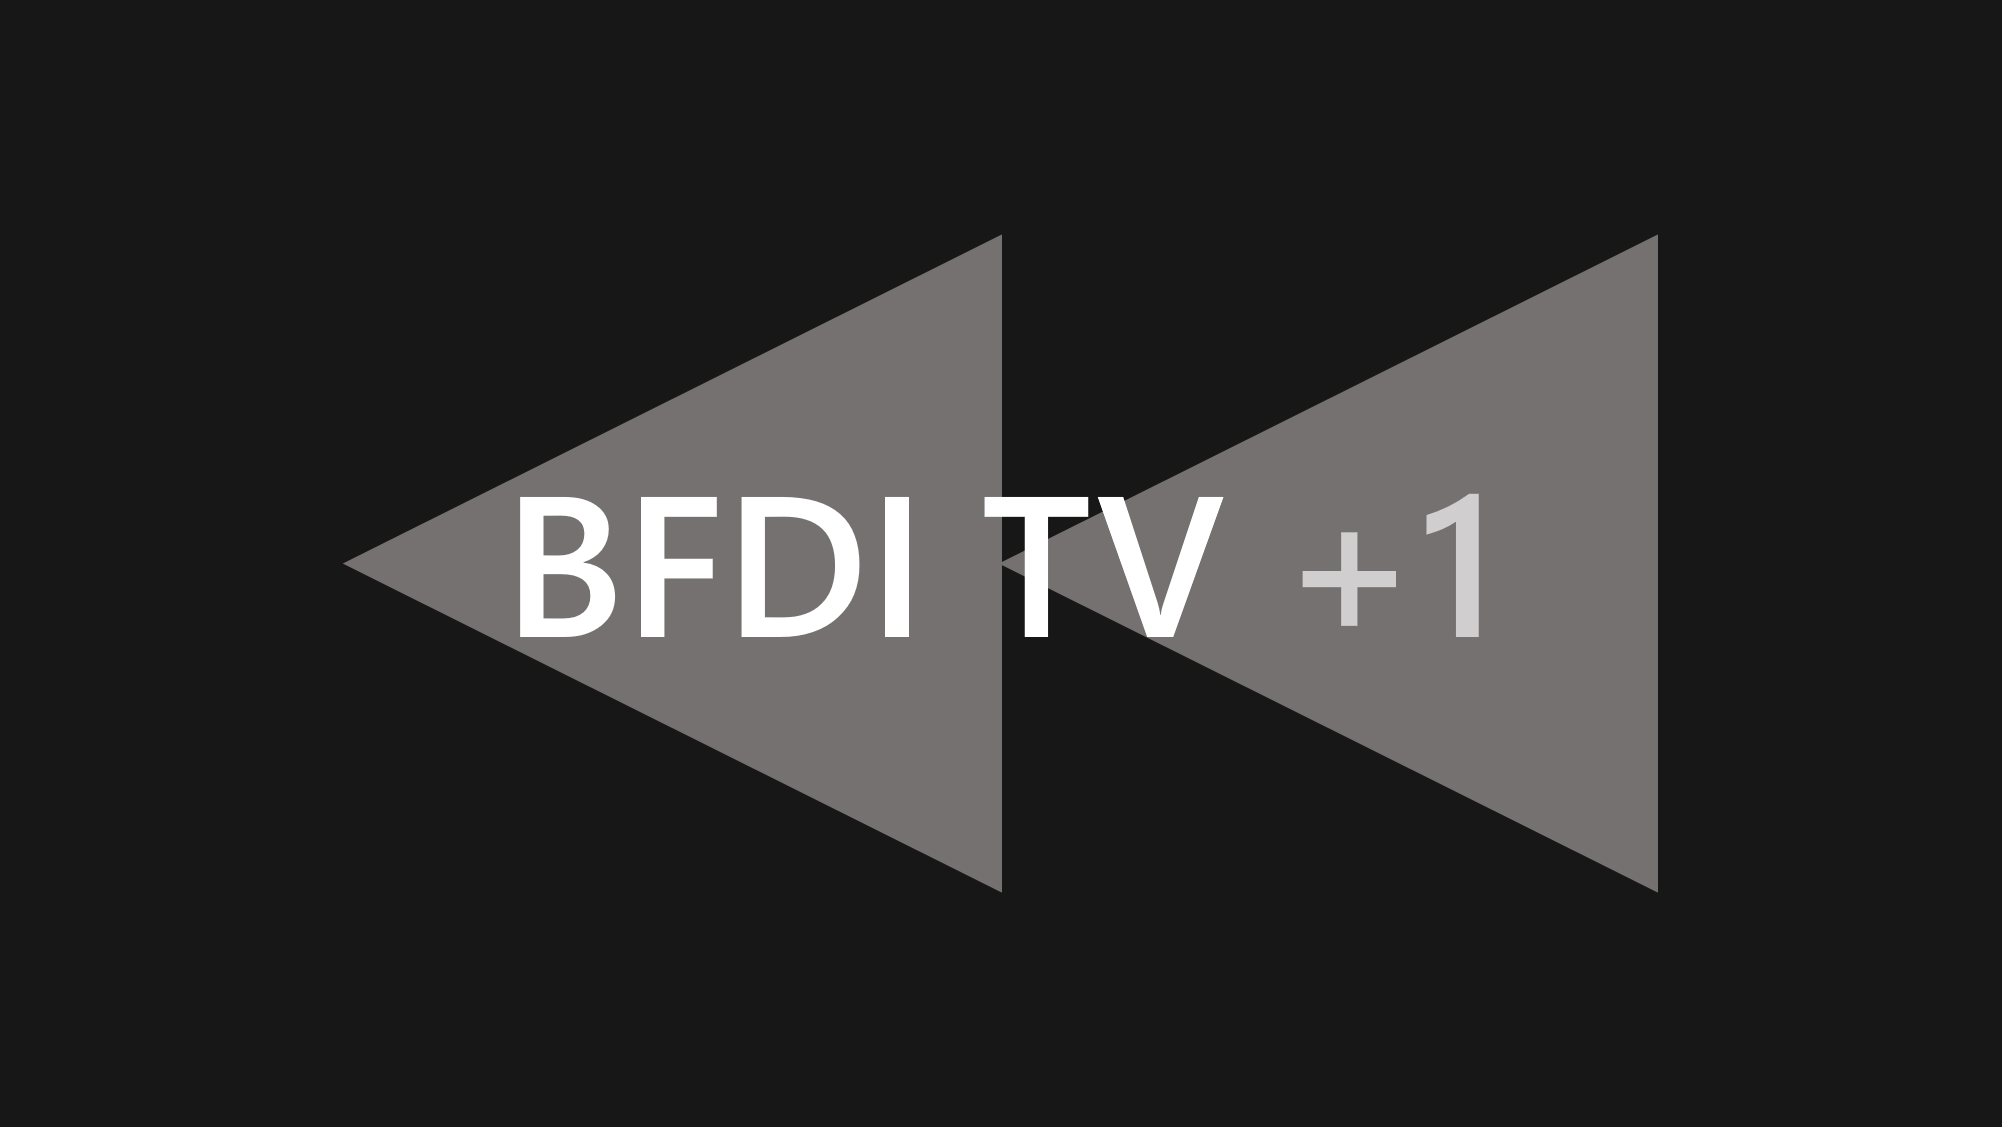 BFB TV +1